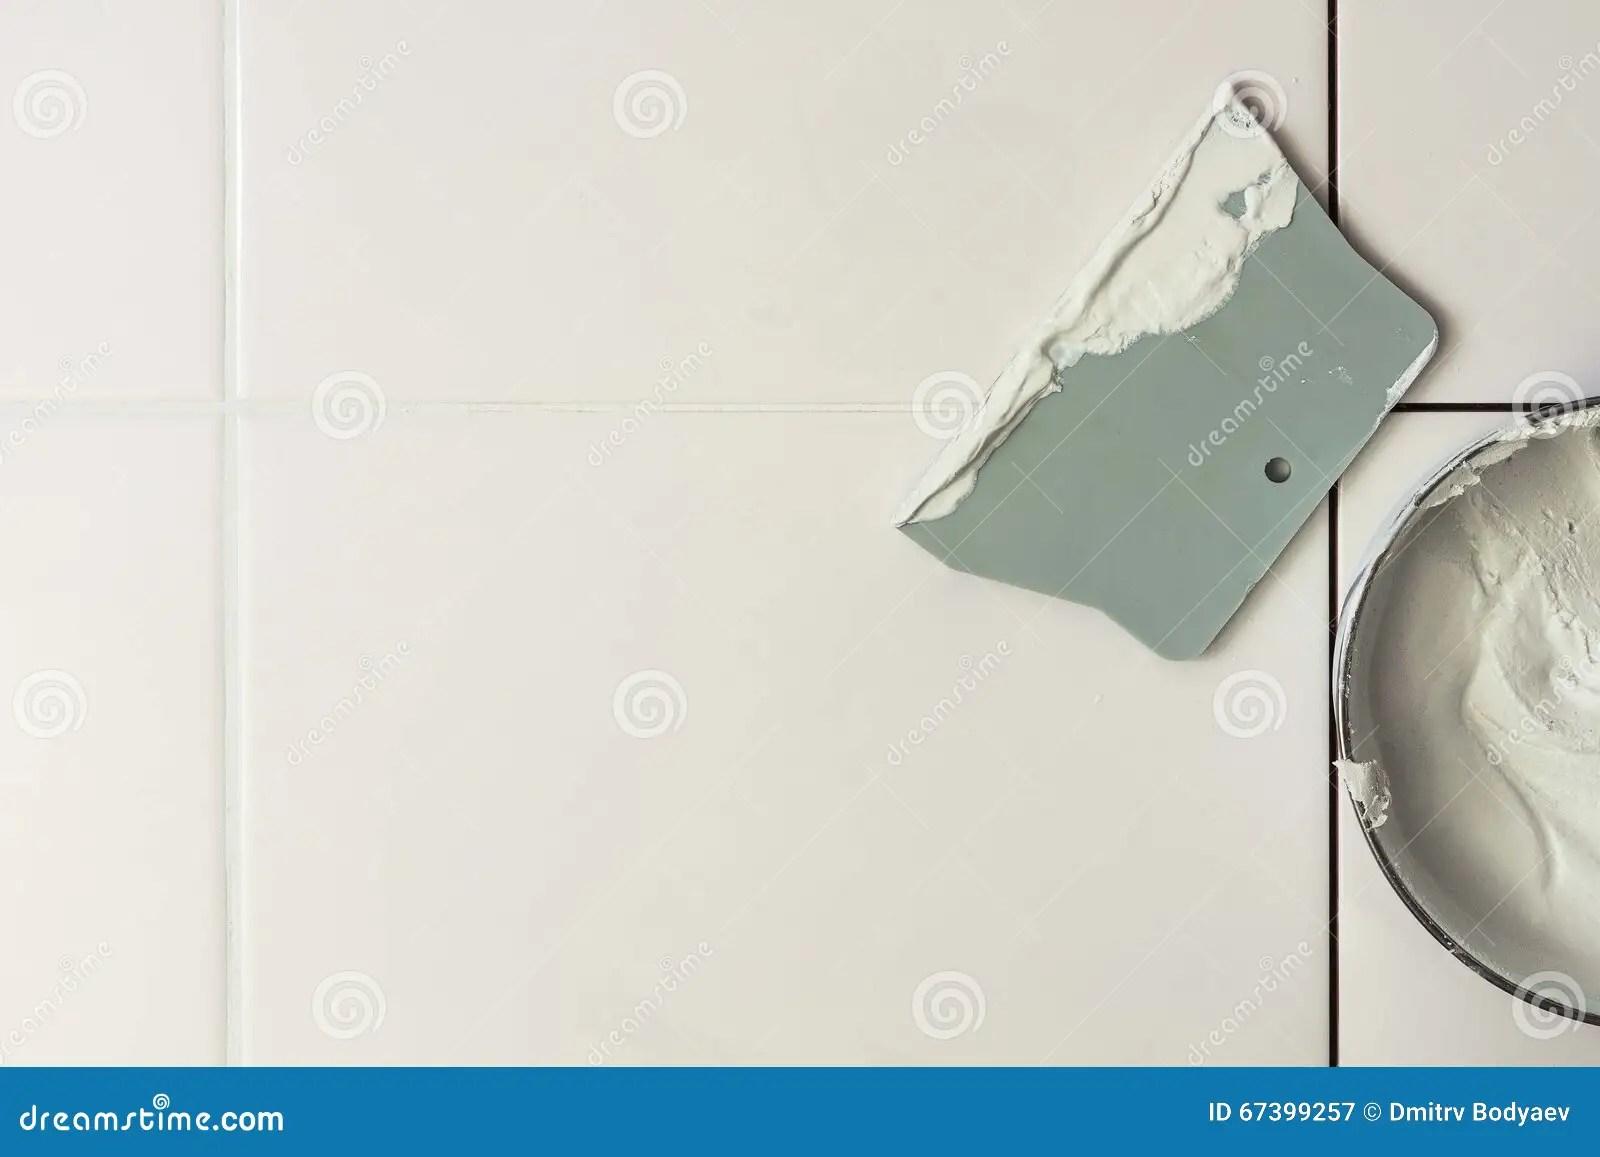 cement tile kitchen grohe faucets parts 瓦片和水泥对小铲库存图片 图片包括有恢复 文本 工具 橡胶 厨房 瓦片和水泥对小铲